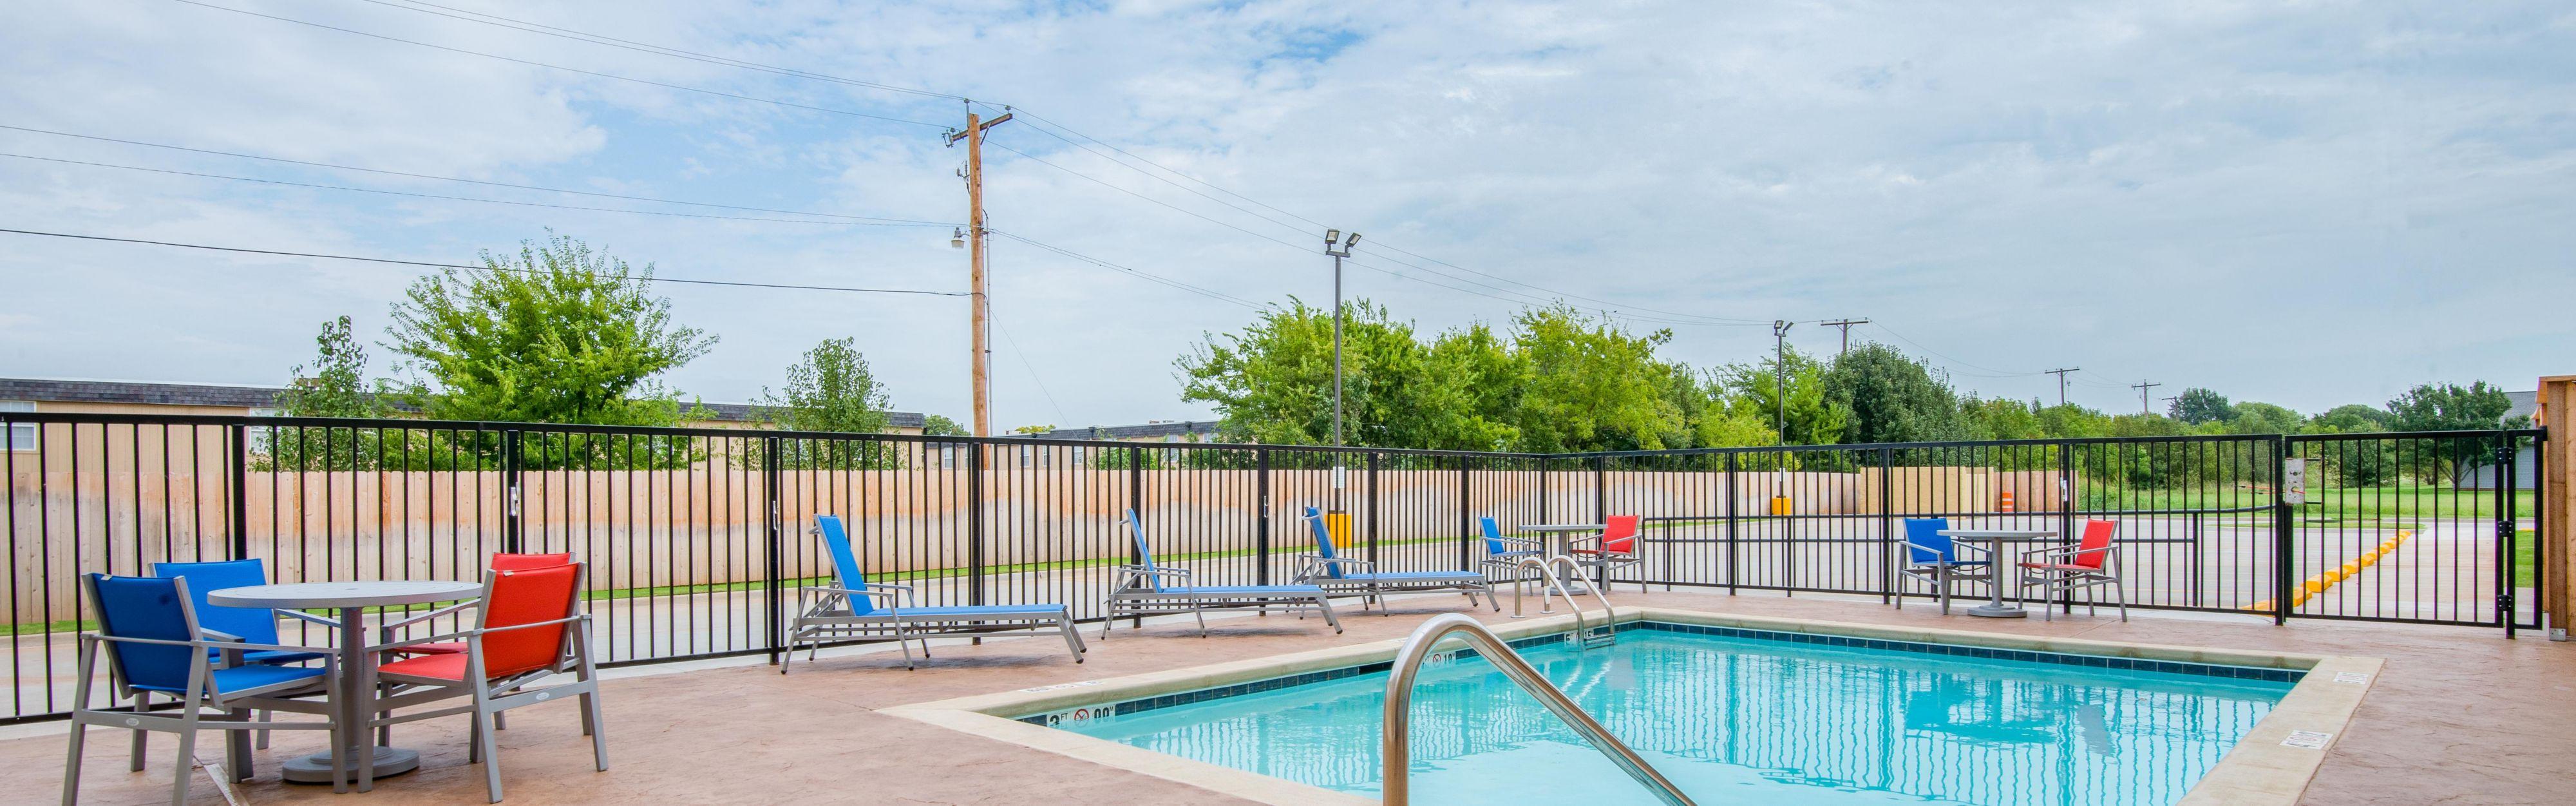 Holiday Inn Express & Suites Stillwater - University Area image 2